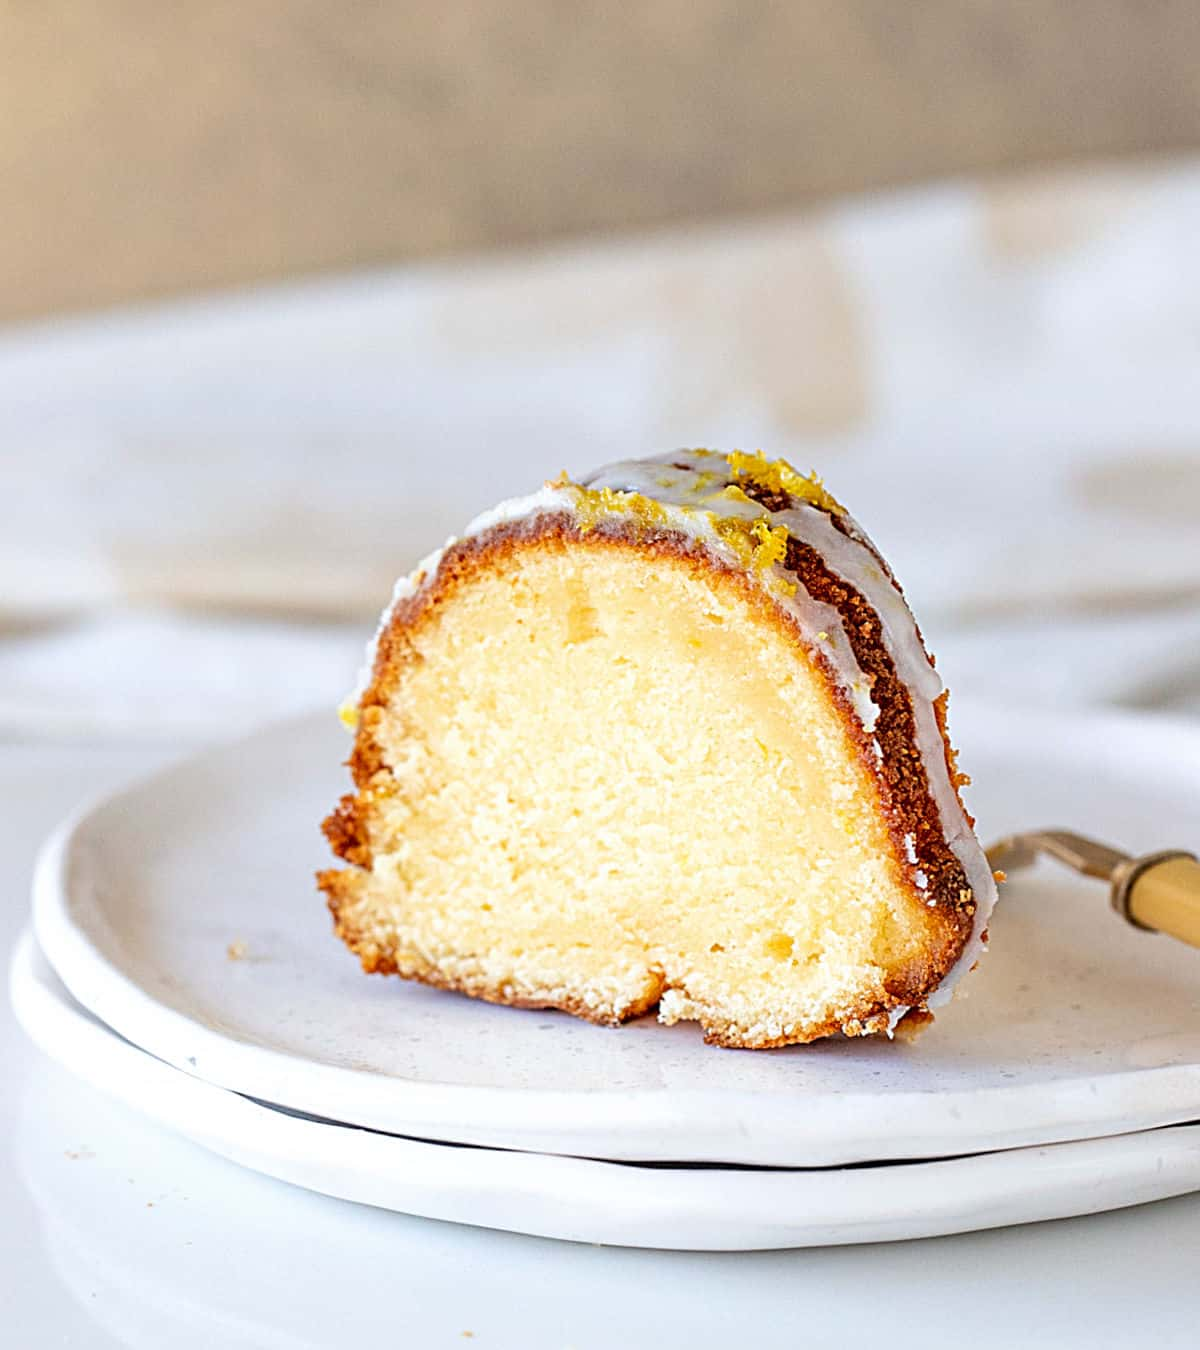 Single slice of lemon bundt cake on stack of white plates